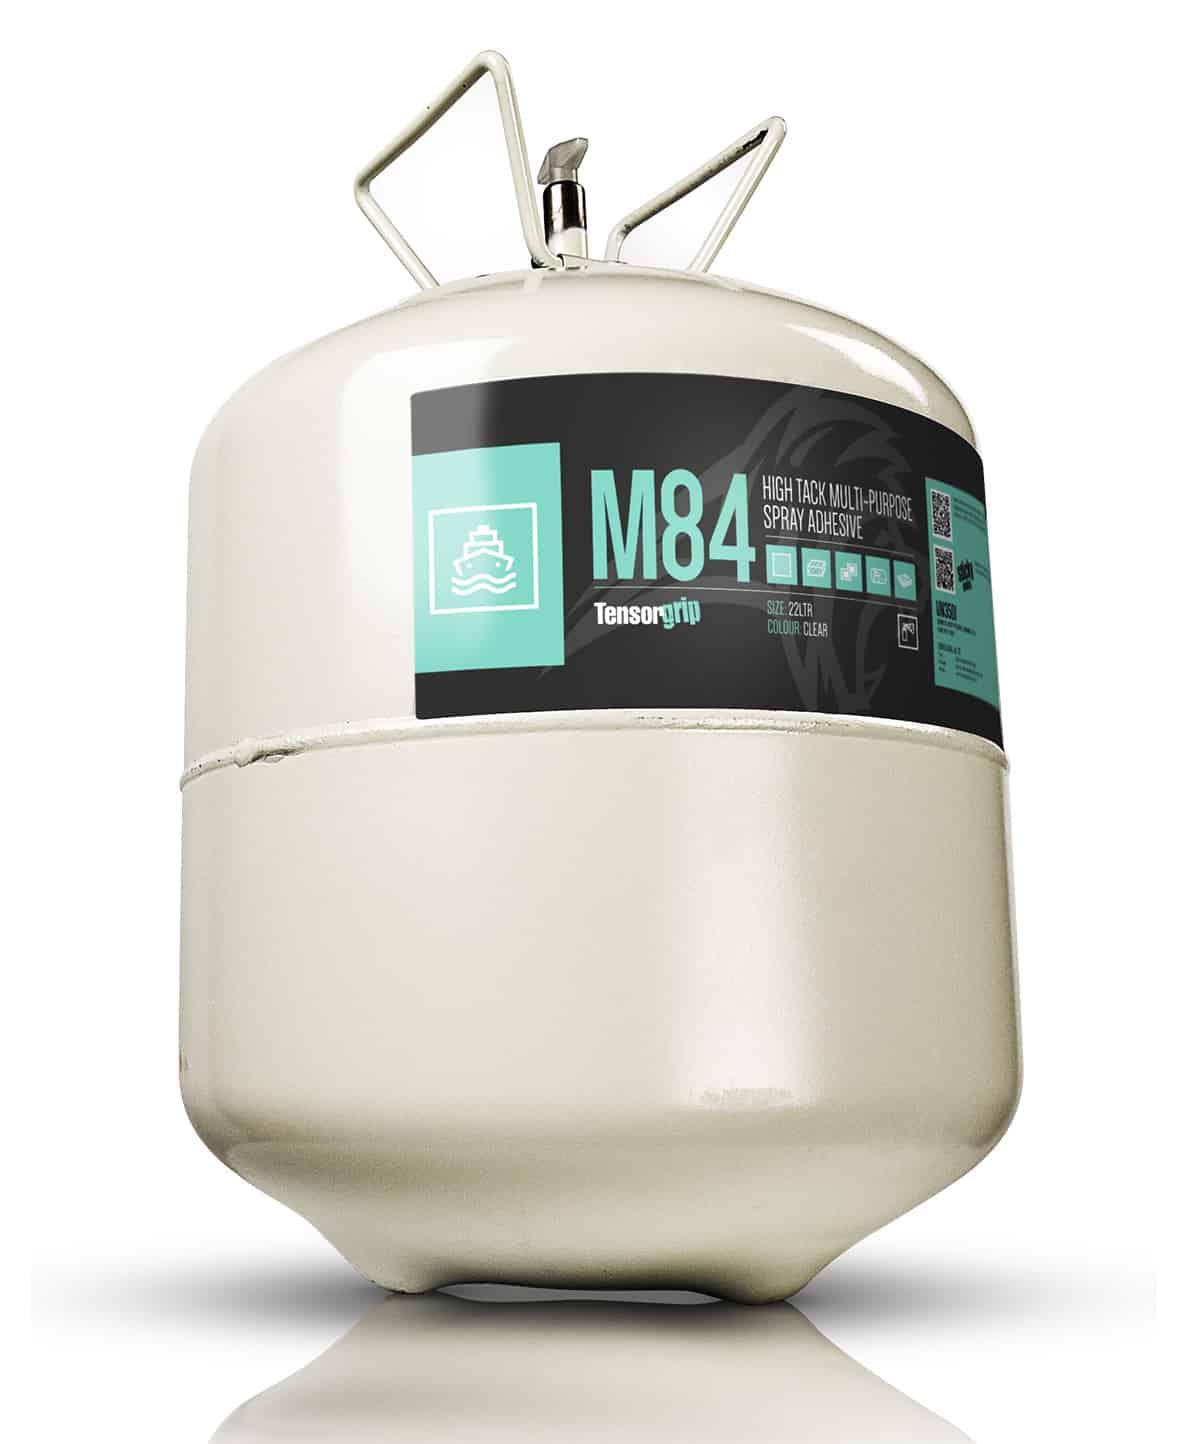 Tensorgrip M84 High Tack Adhesive